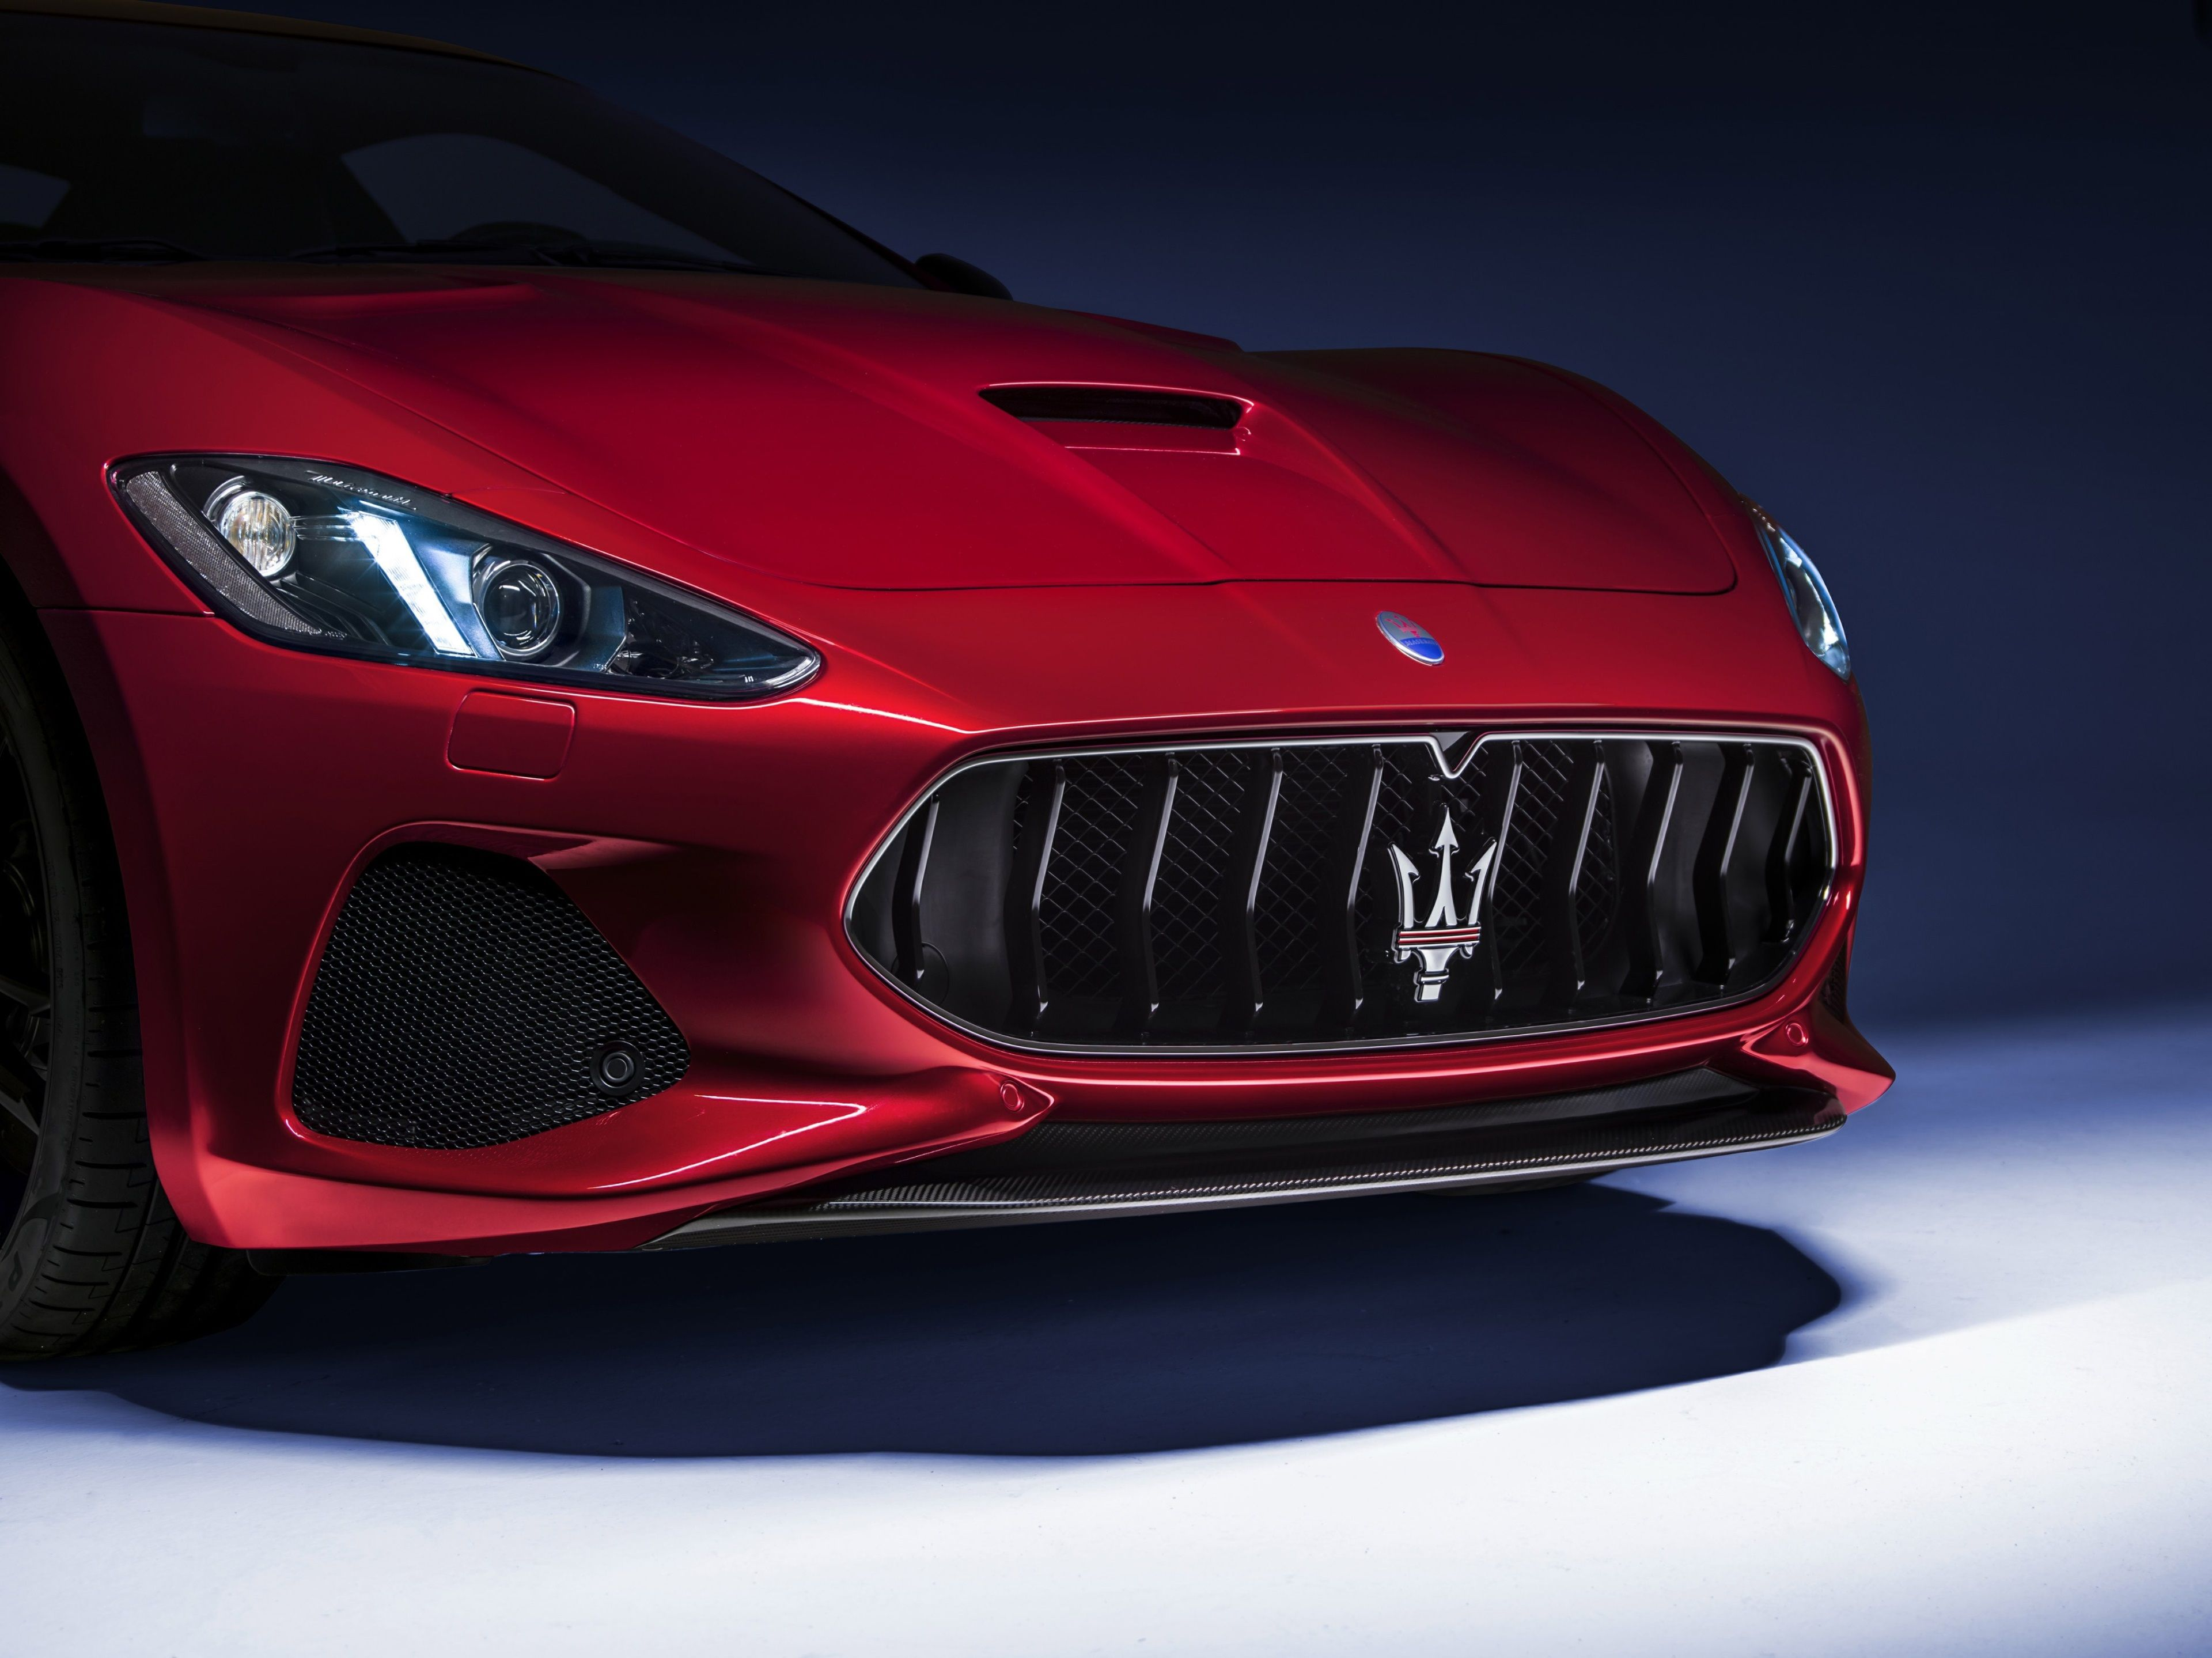 3840x2878 Maserati Granturismo 4k Best Free Wallpaper Maserati